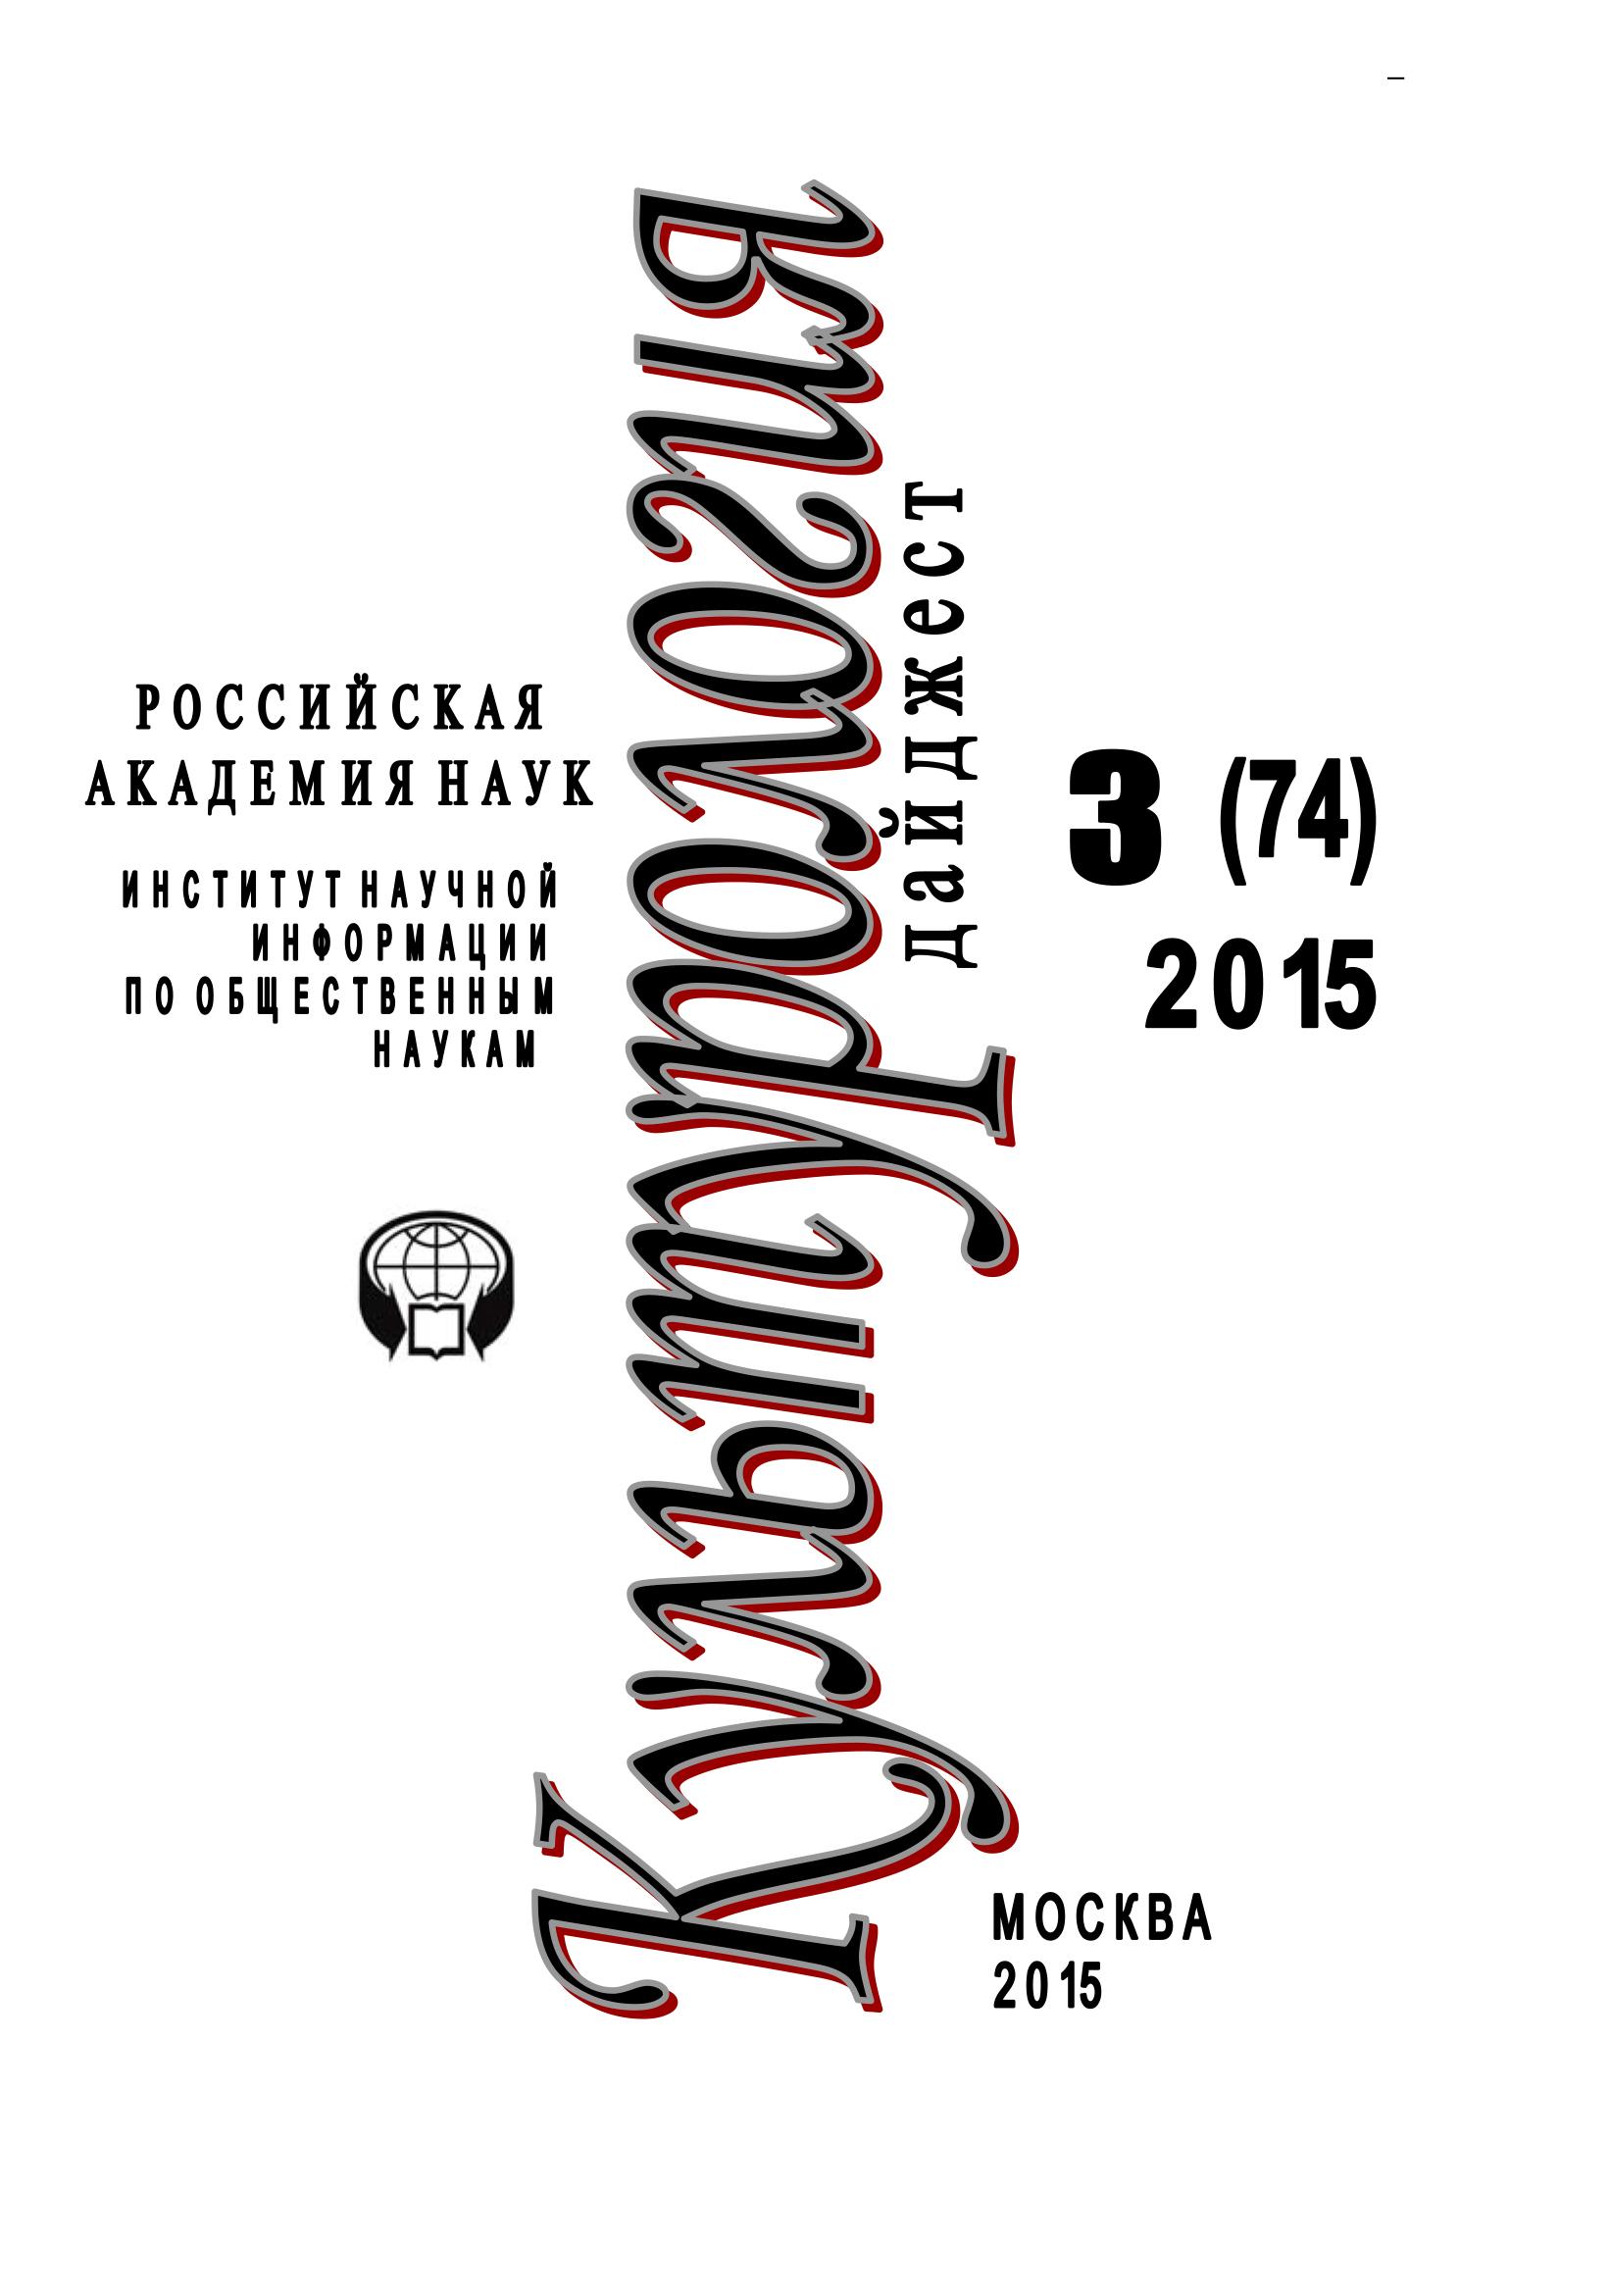 Ирина Галинская Культурология. Дайджест №3 / 2015 ирина галинская культурология дайджест 1 2015